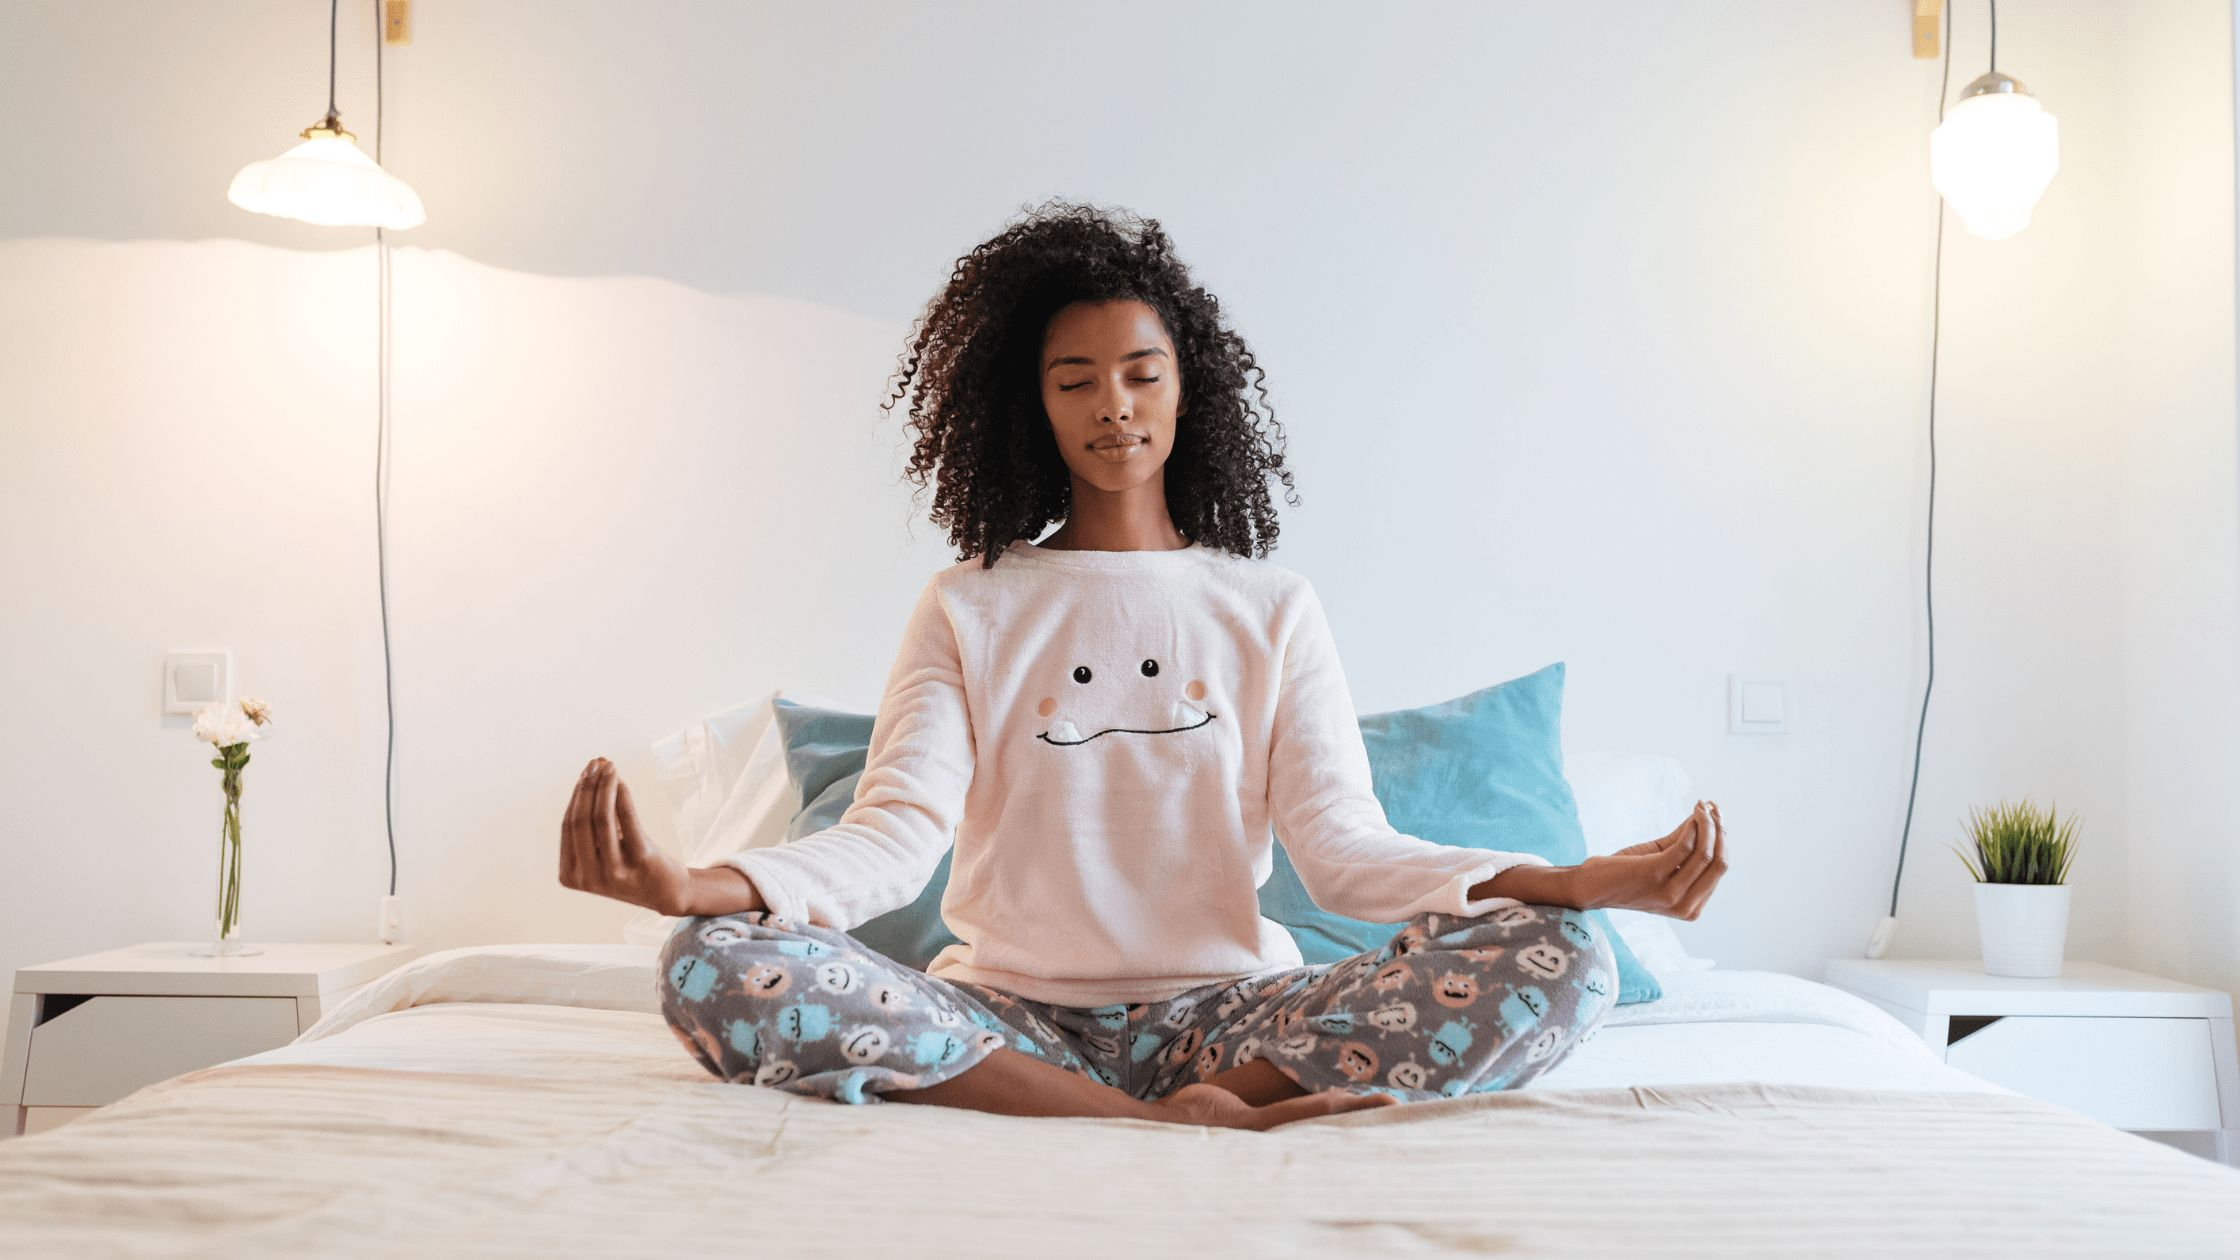 girl meditating on bed